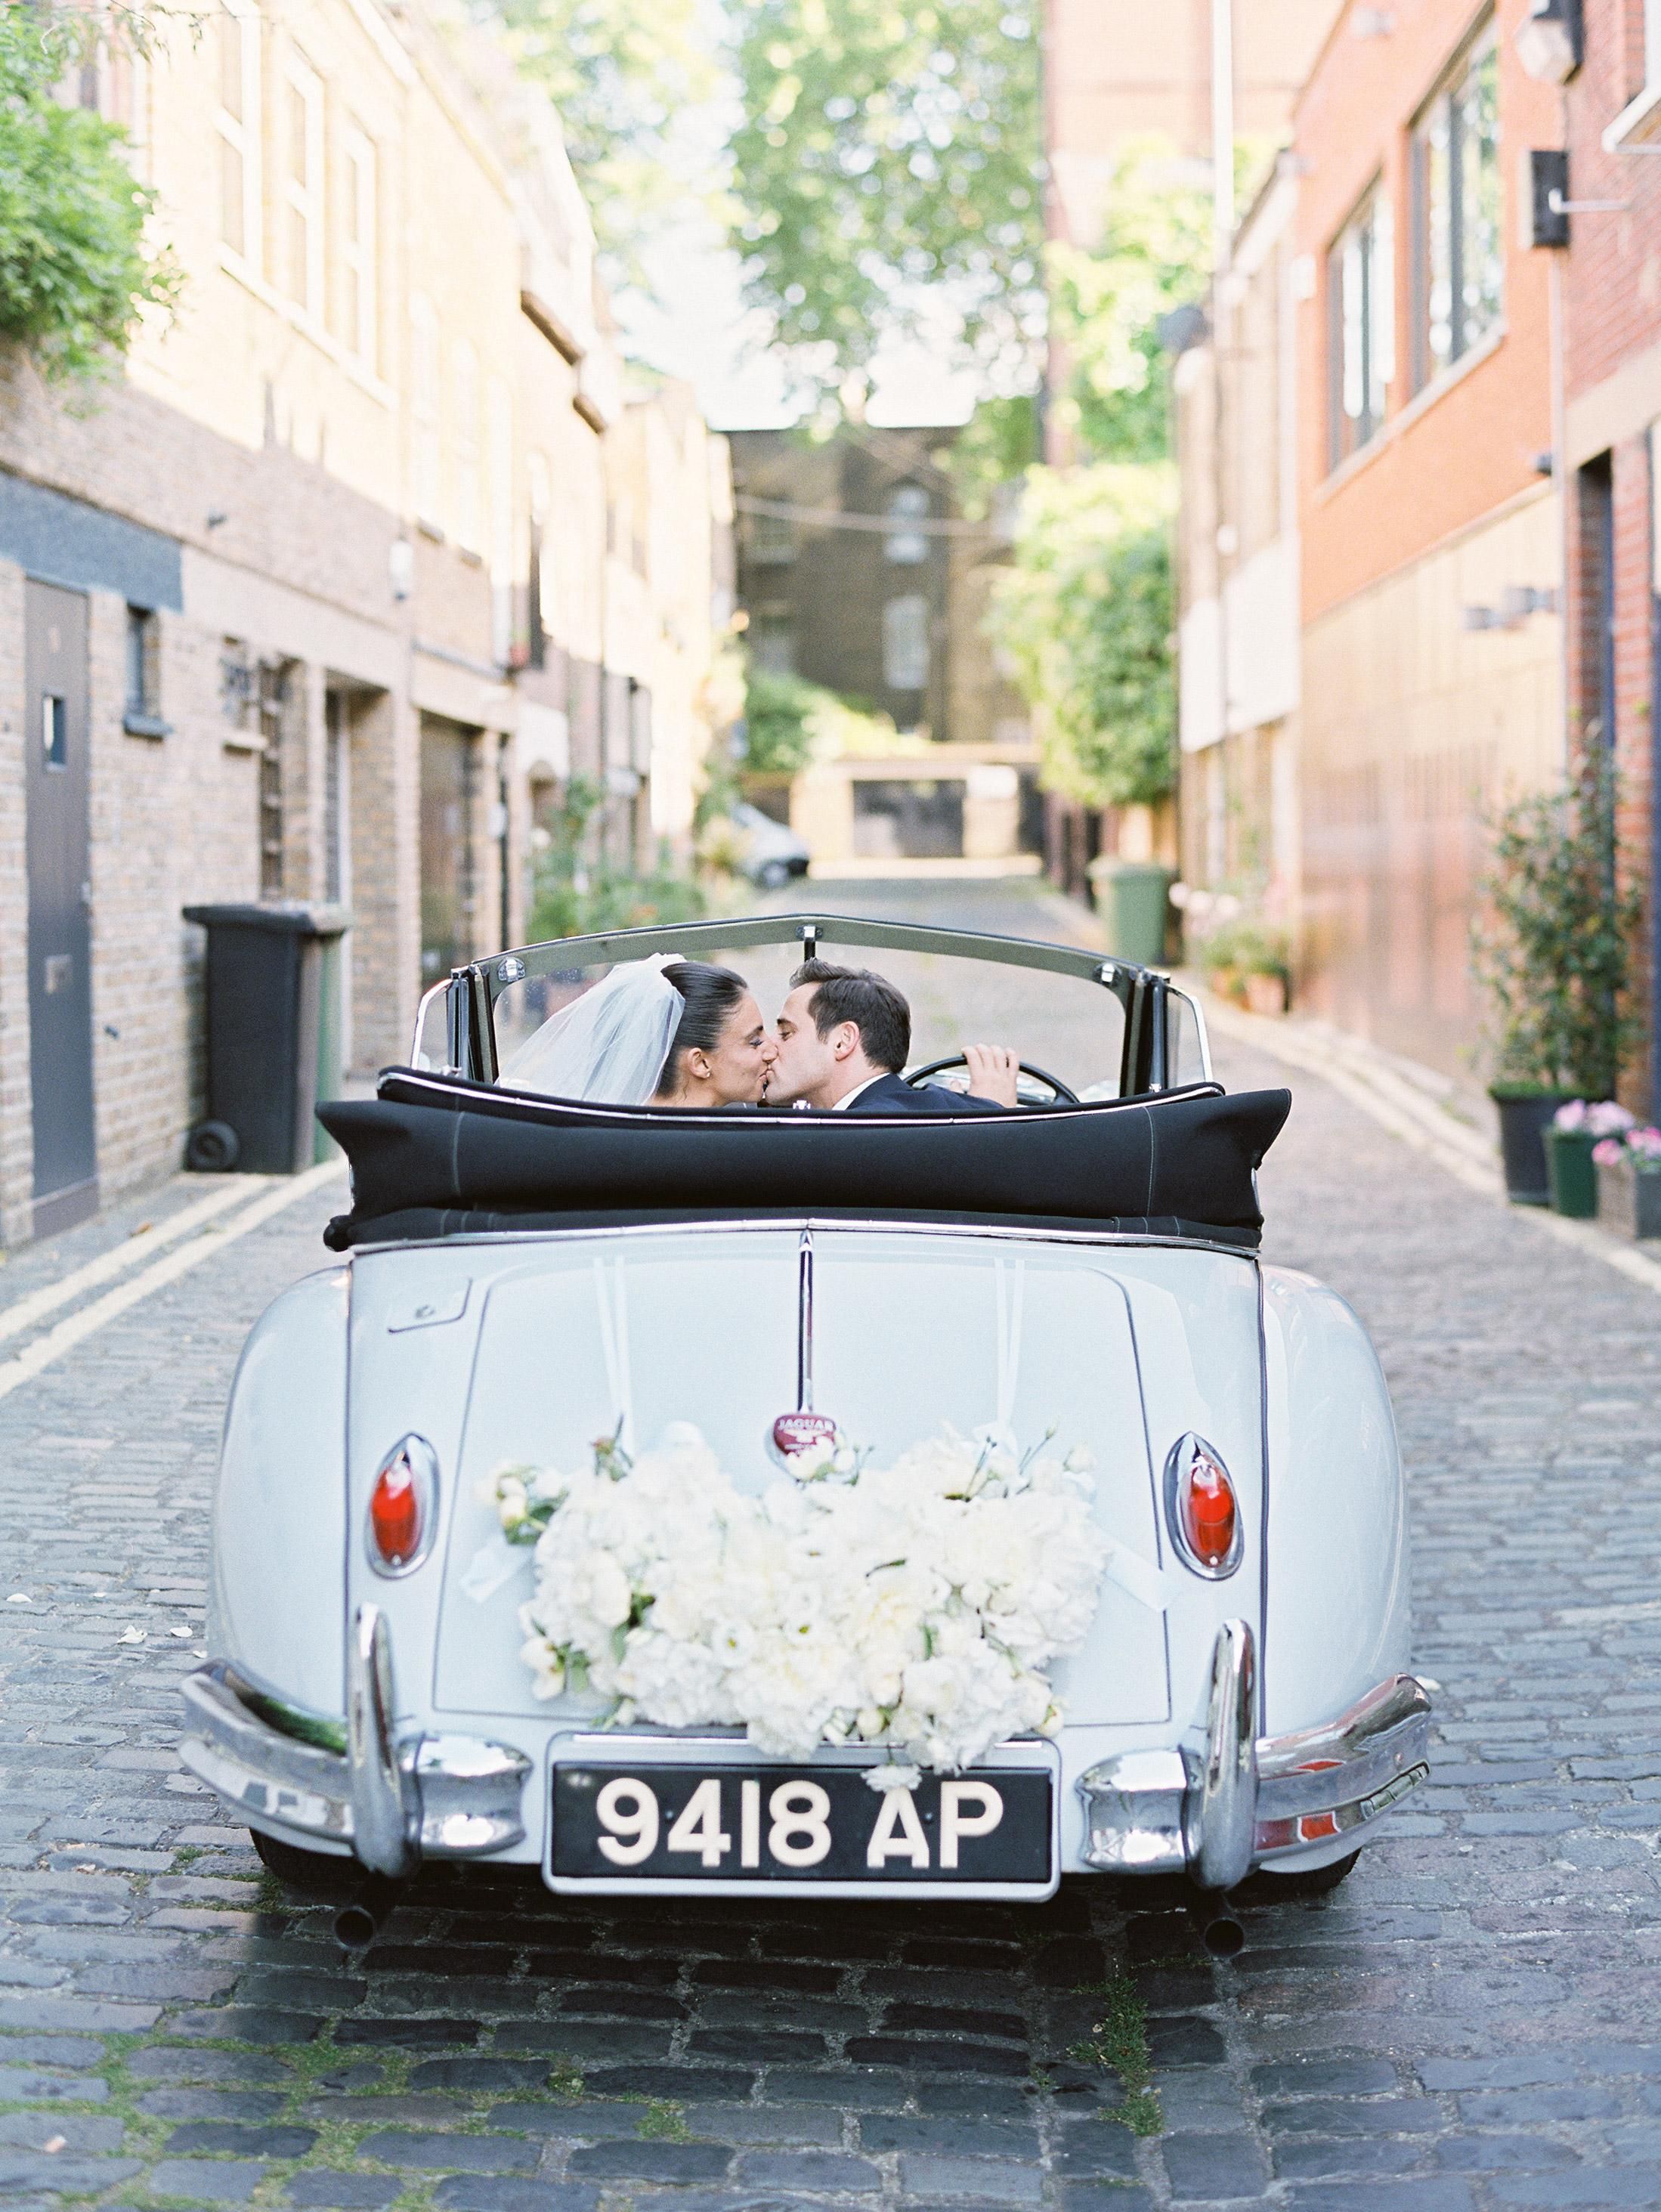 When Should You Depart for Your Honeymoon?